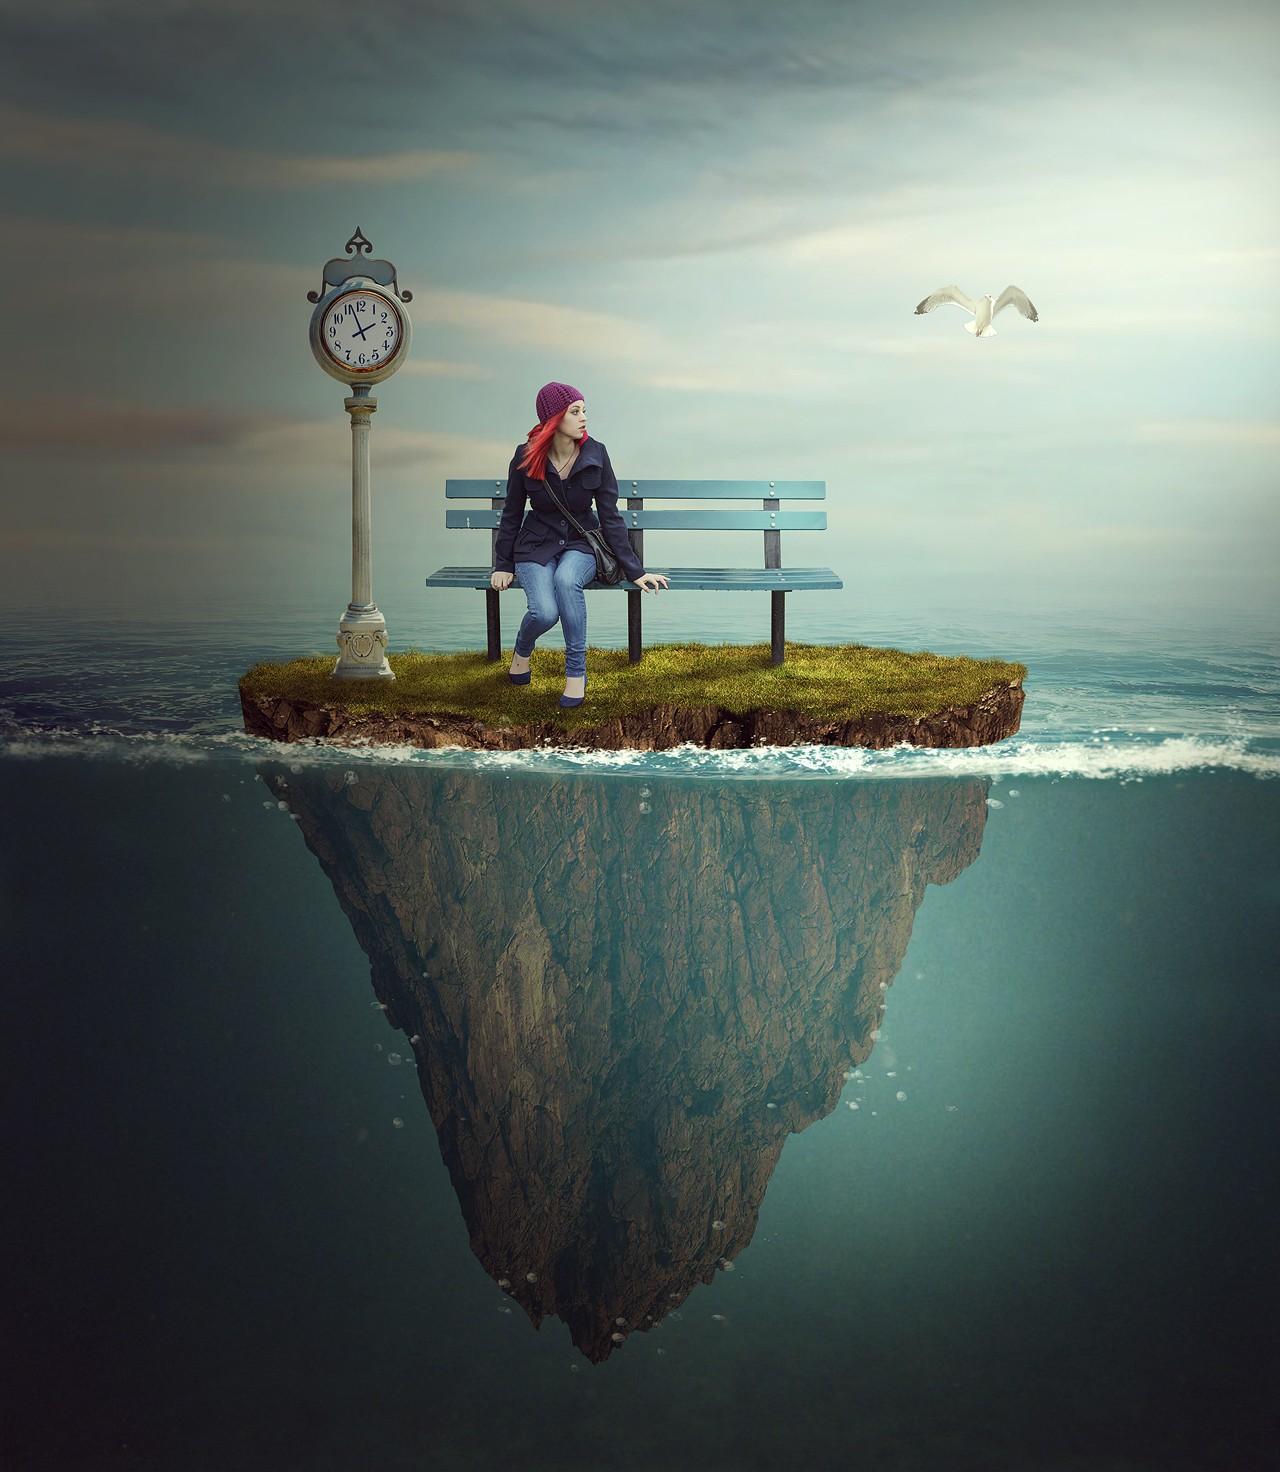 PS-《海中孤岛-唯美》创意海报合成